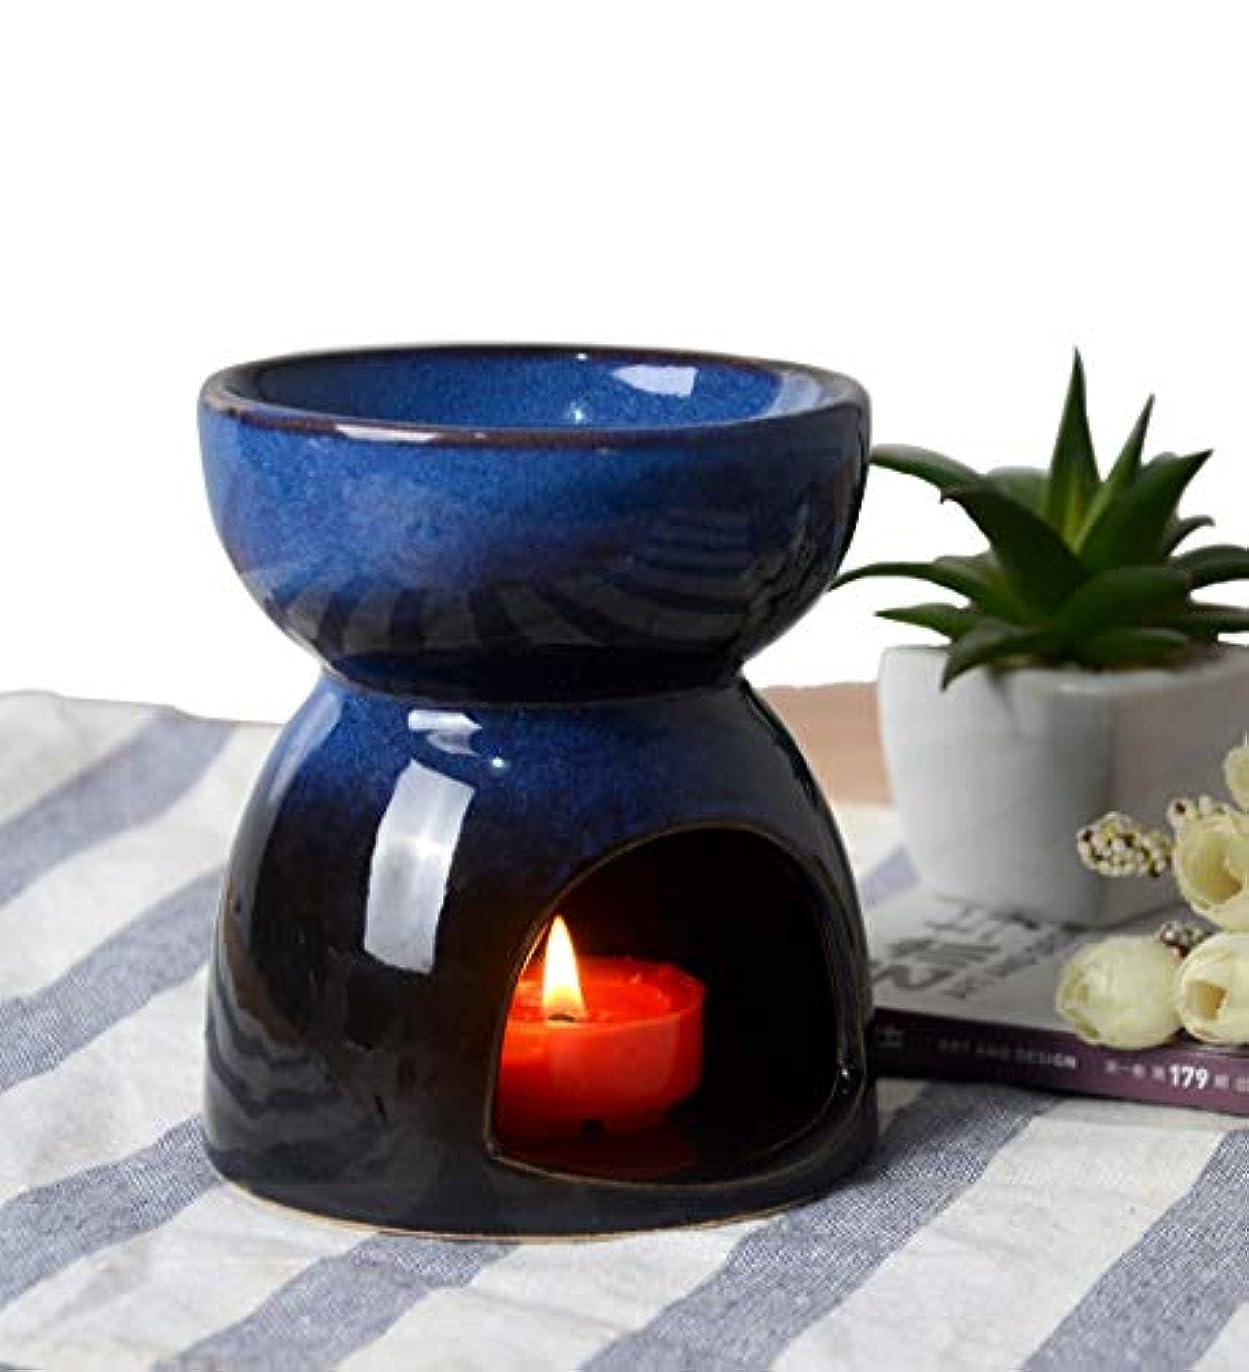 Hwagui お香 茶 香炉 アロマ炉 中空の彫刻工芸 癒し お茶の香り 陶器 置物 靑い